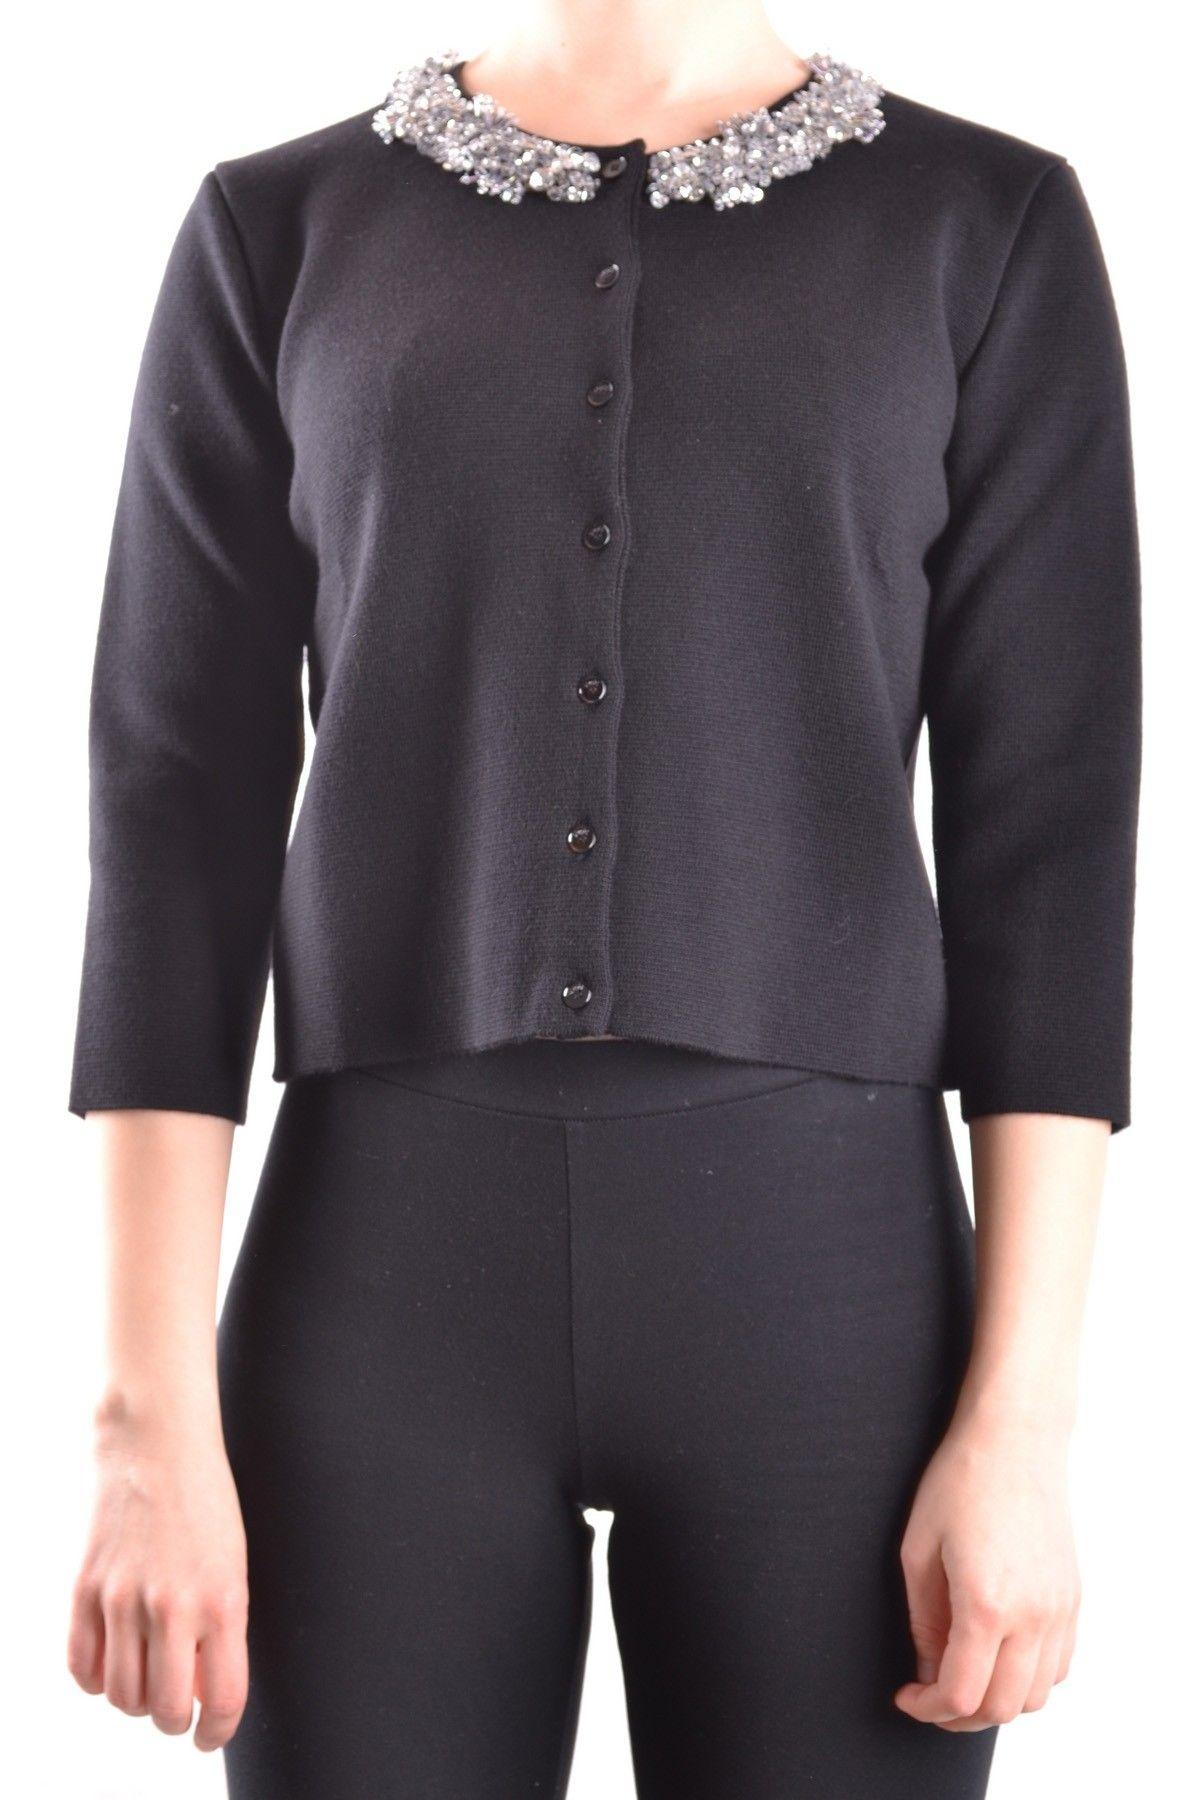 Blugirl Blumarine Women's Cardigan In Black